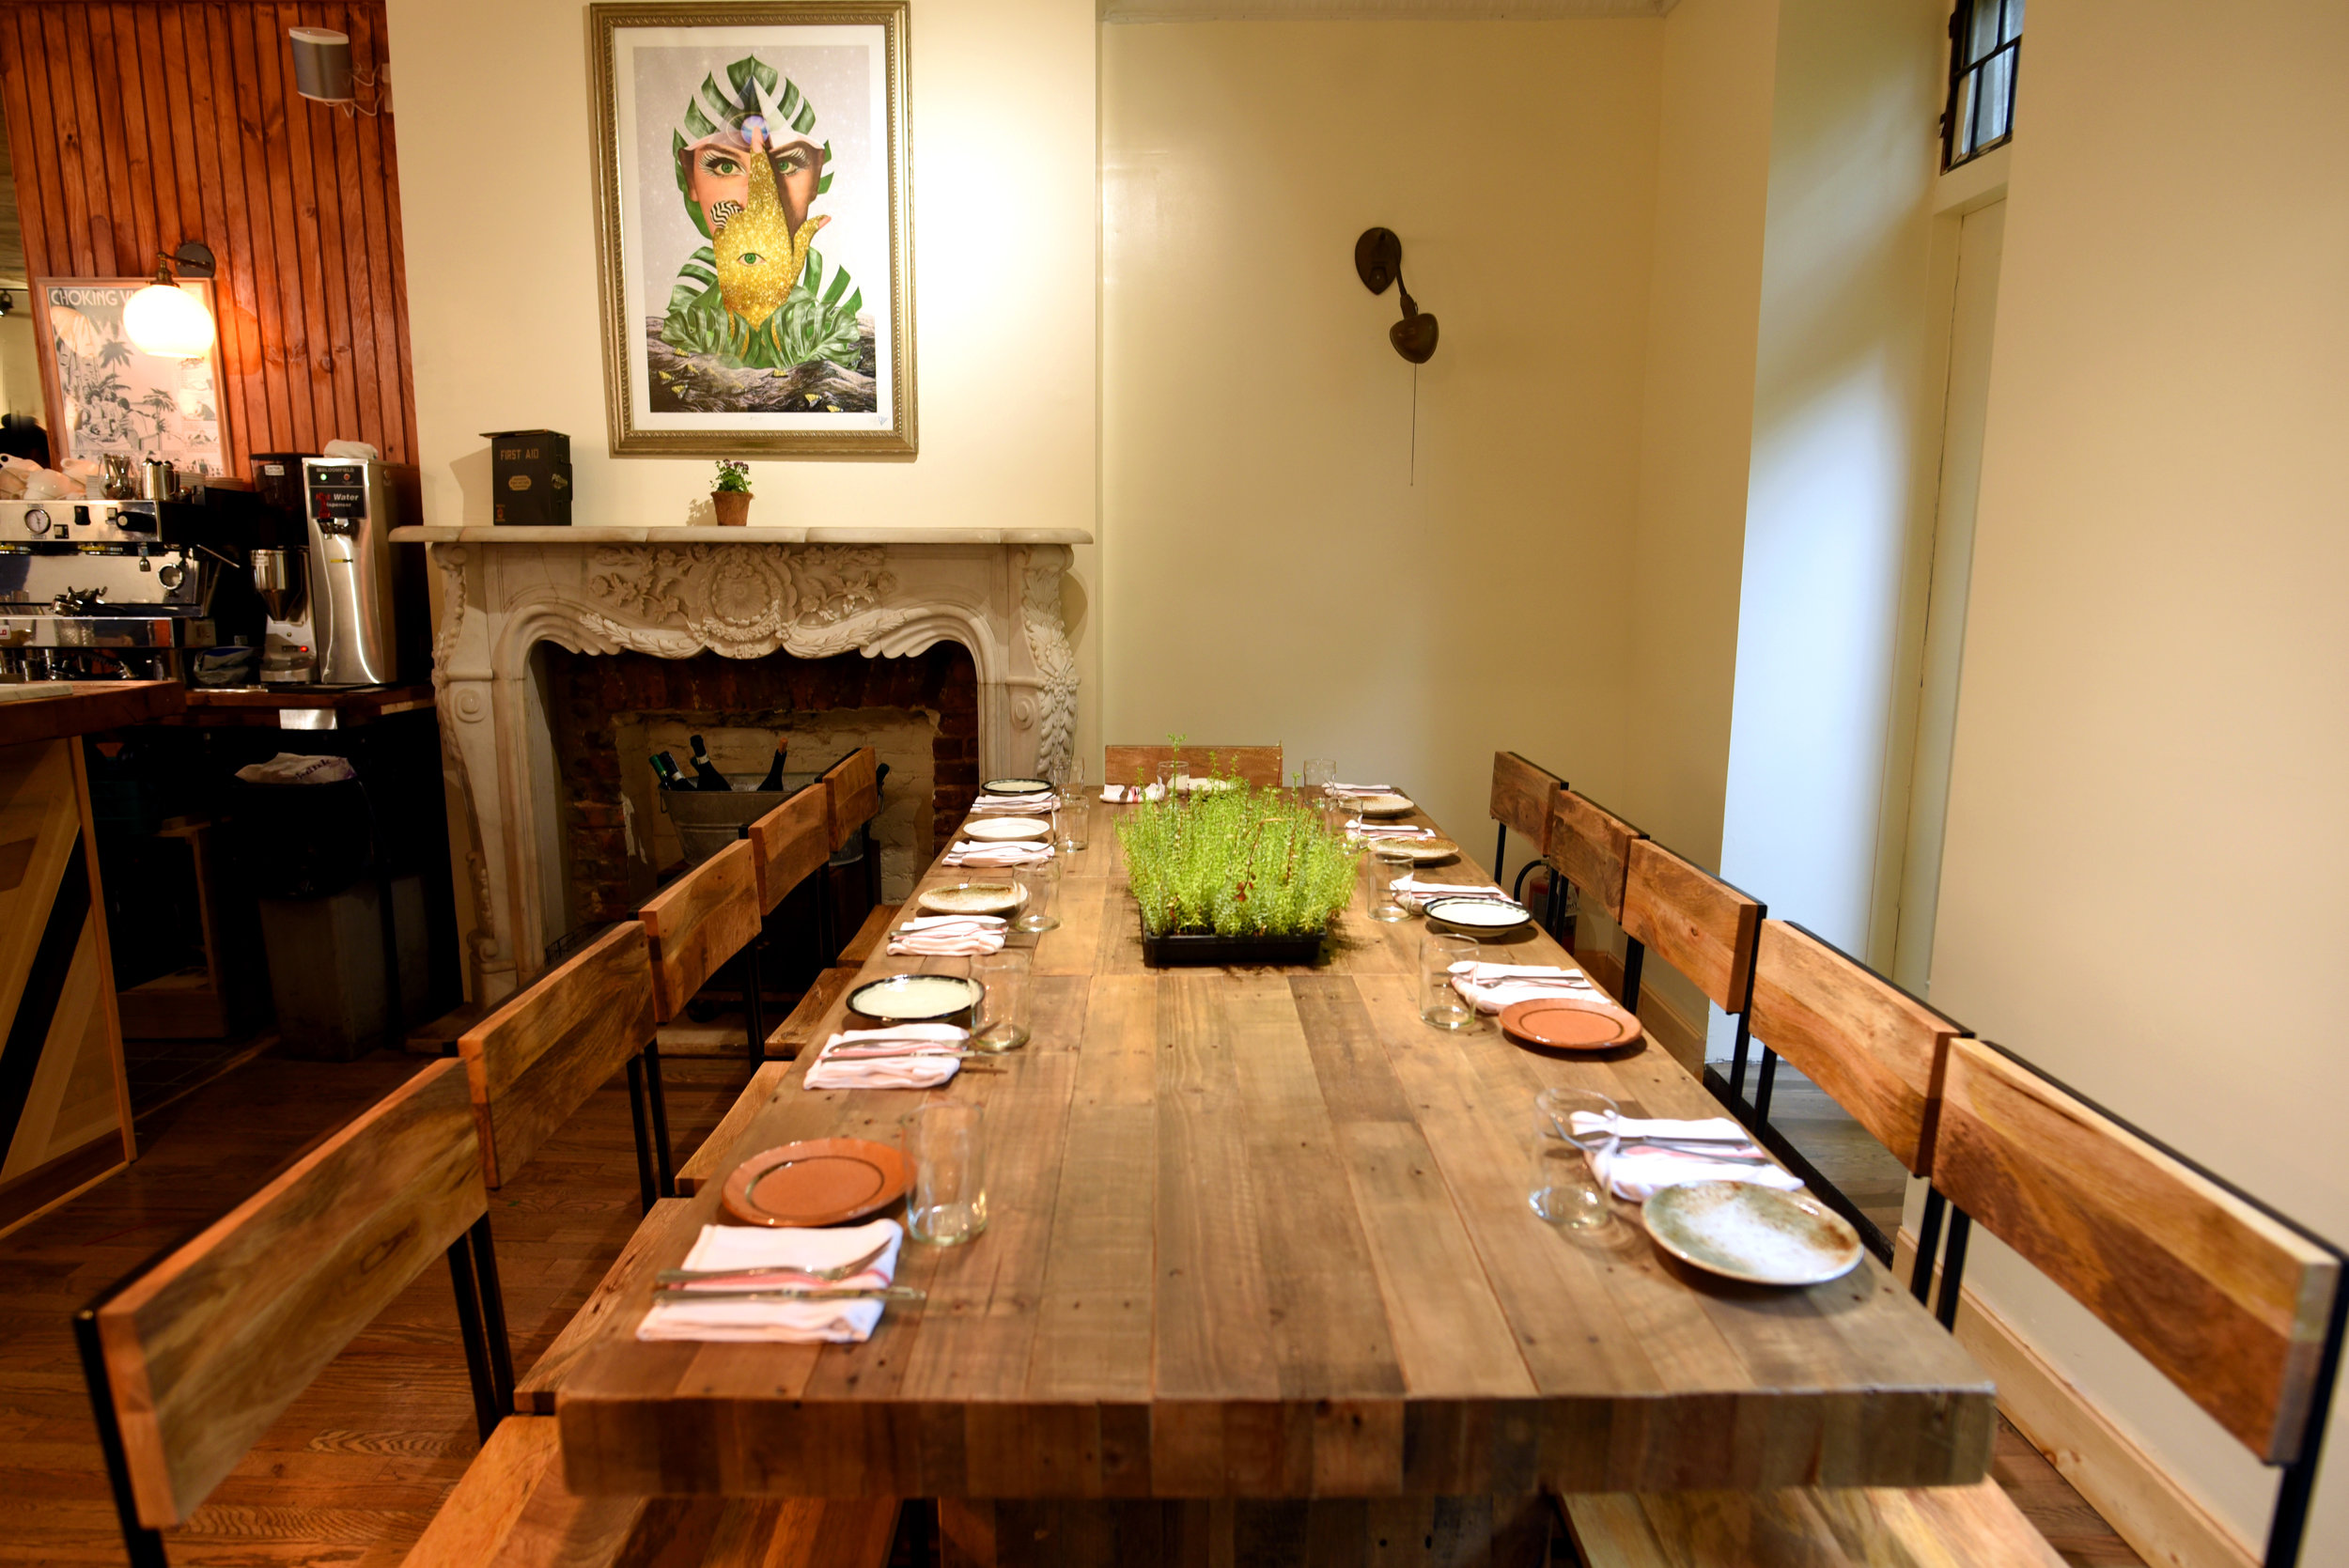 Miss Ada Communal Table 2 by Michael Tulipan.JPG